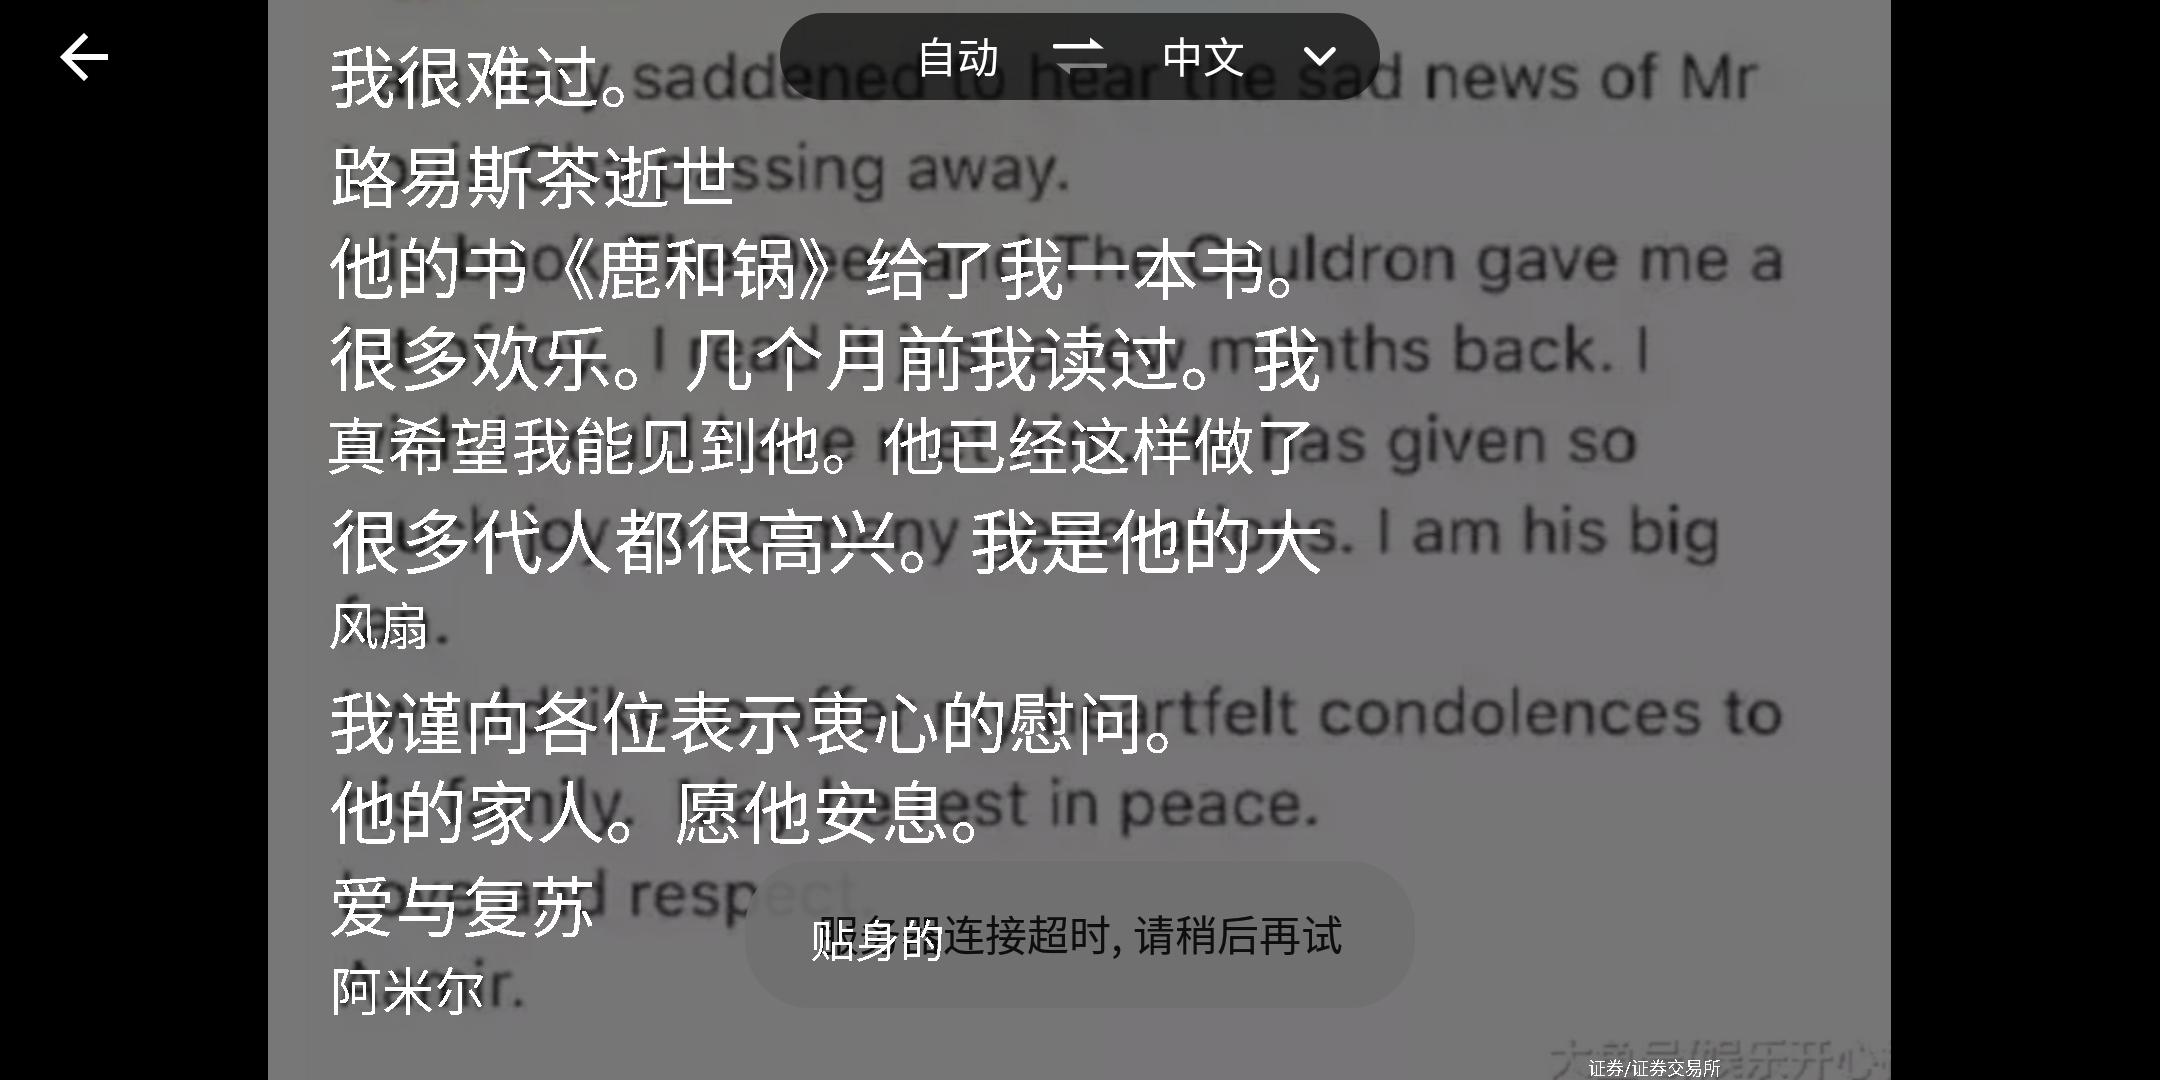 Screenshot_2018-12-08-21-15-37.png